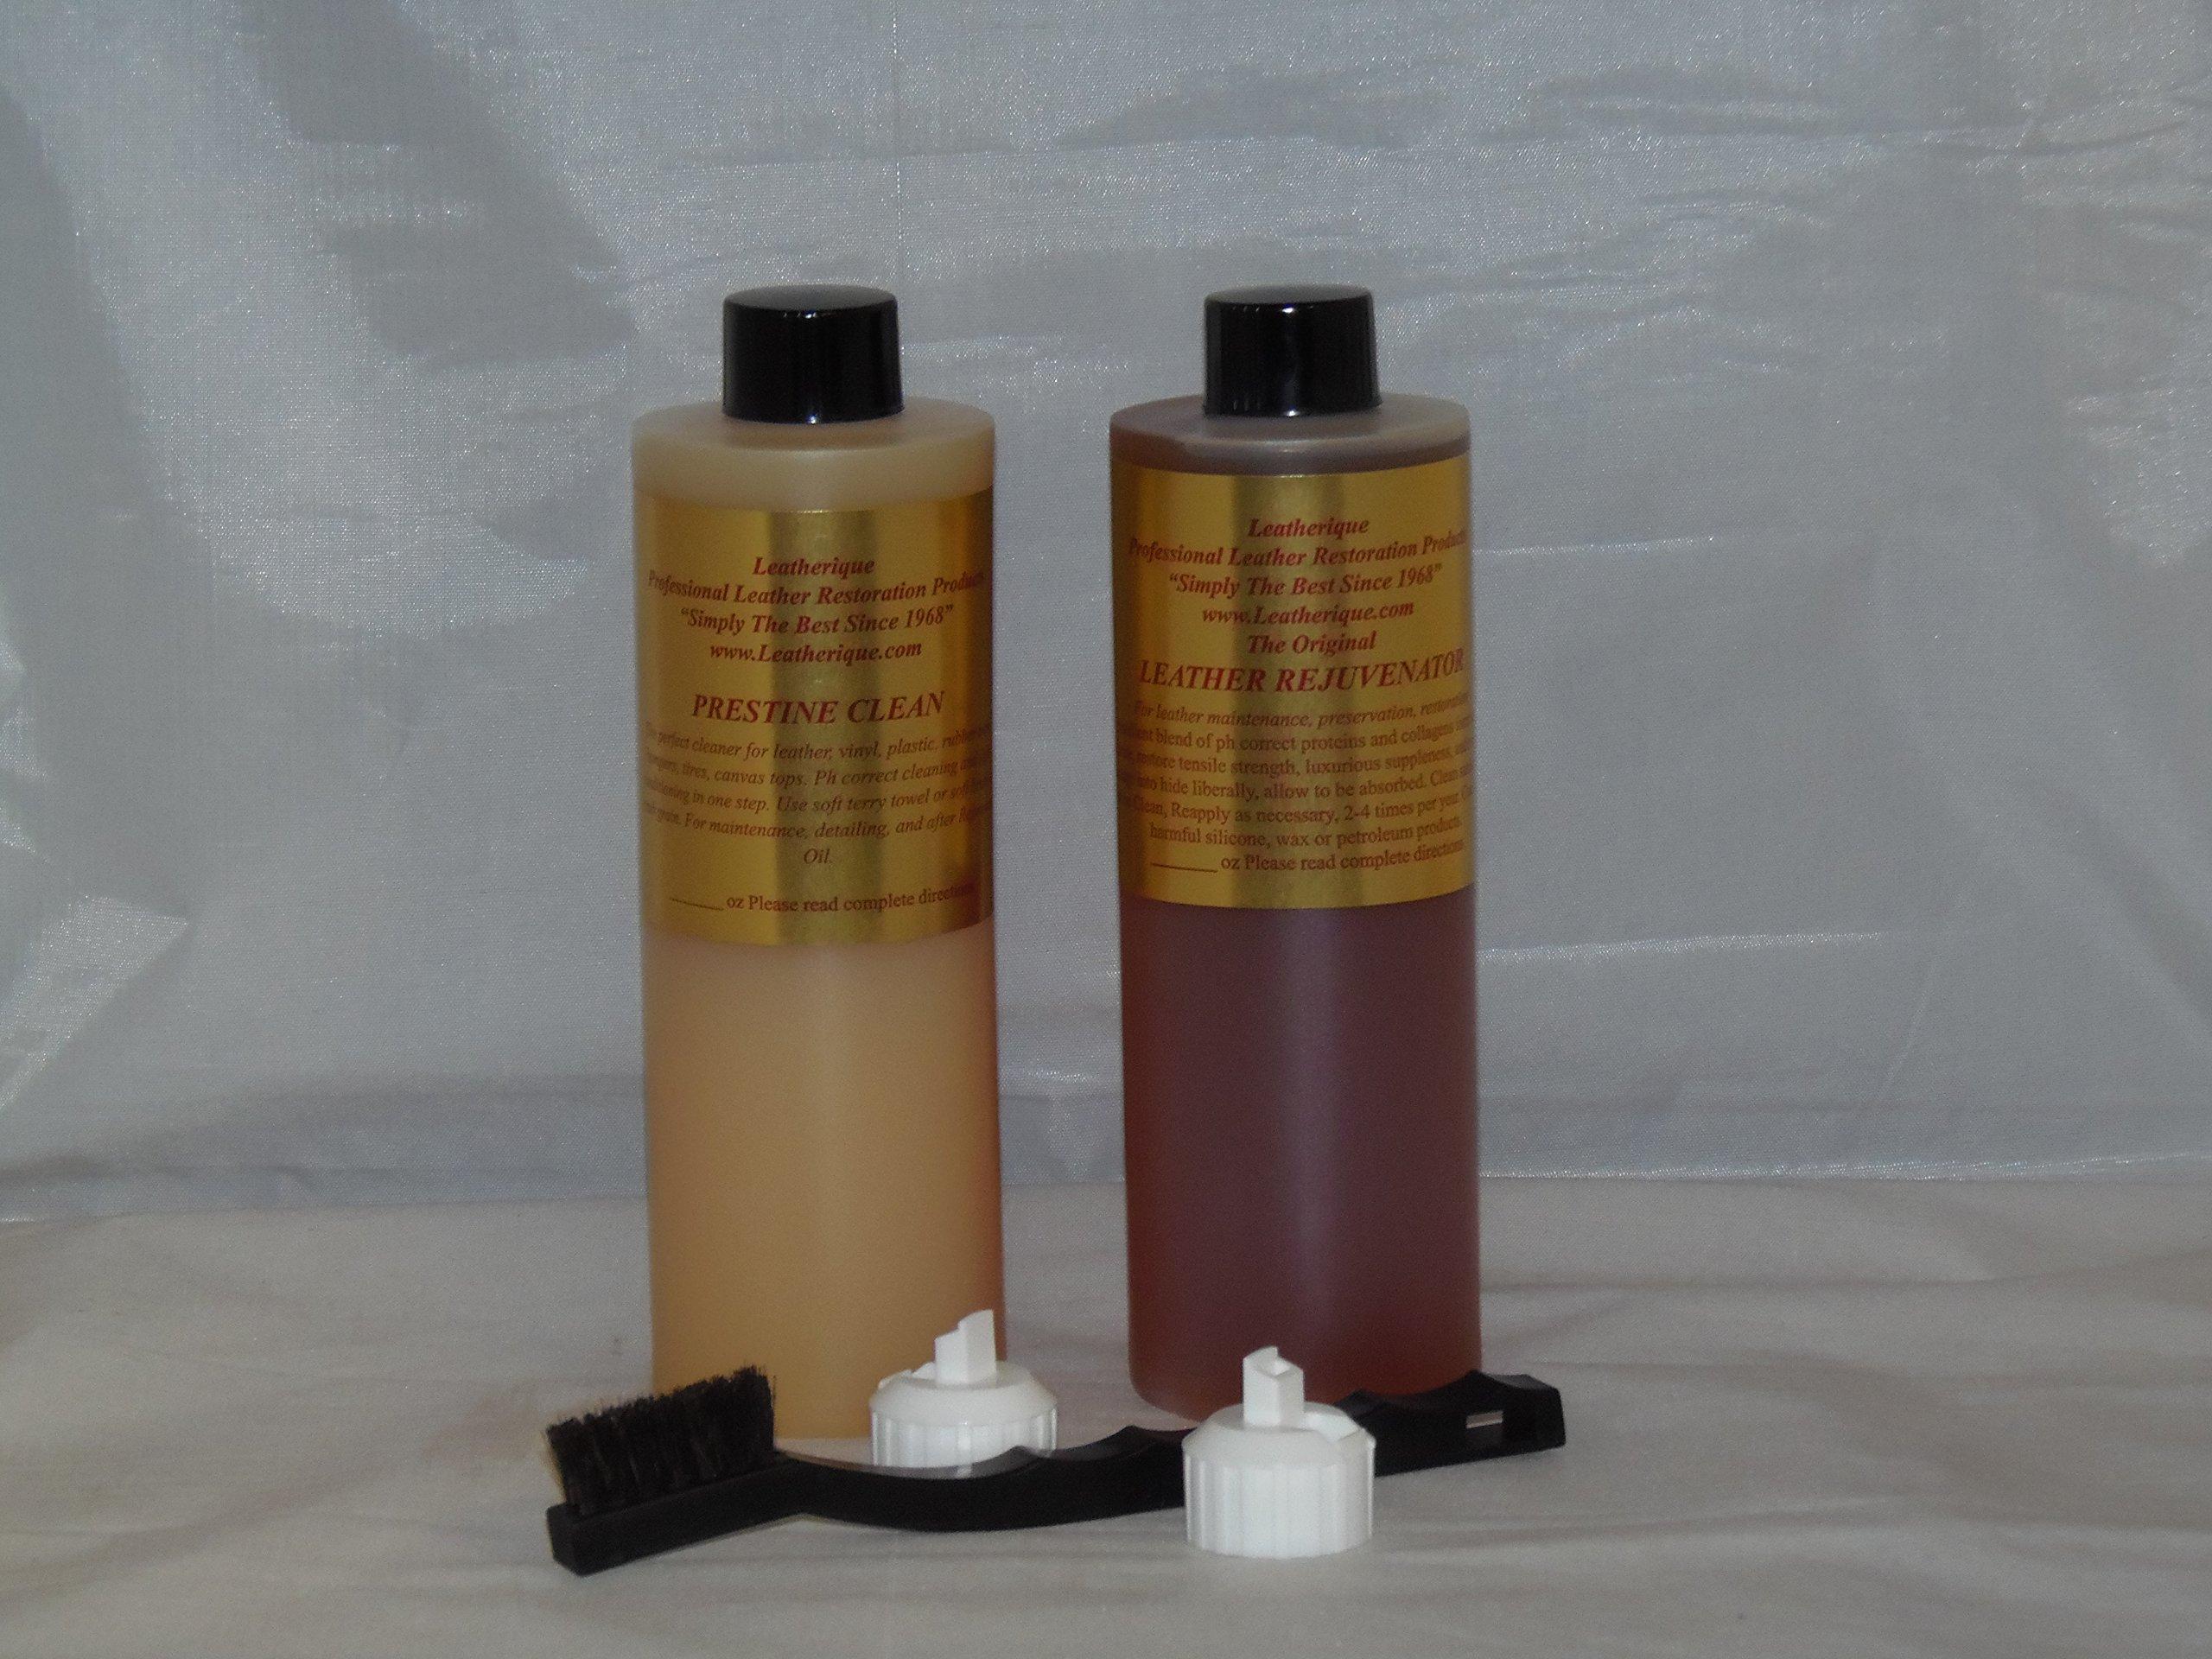 Leatherique Prestine Clean Rejuvenator kit 16oz.